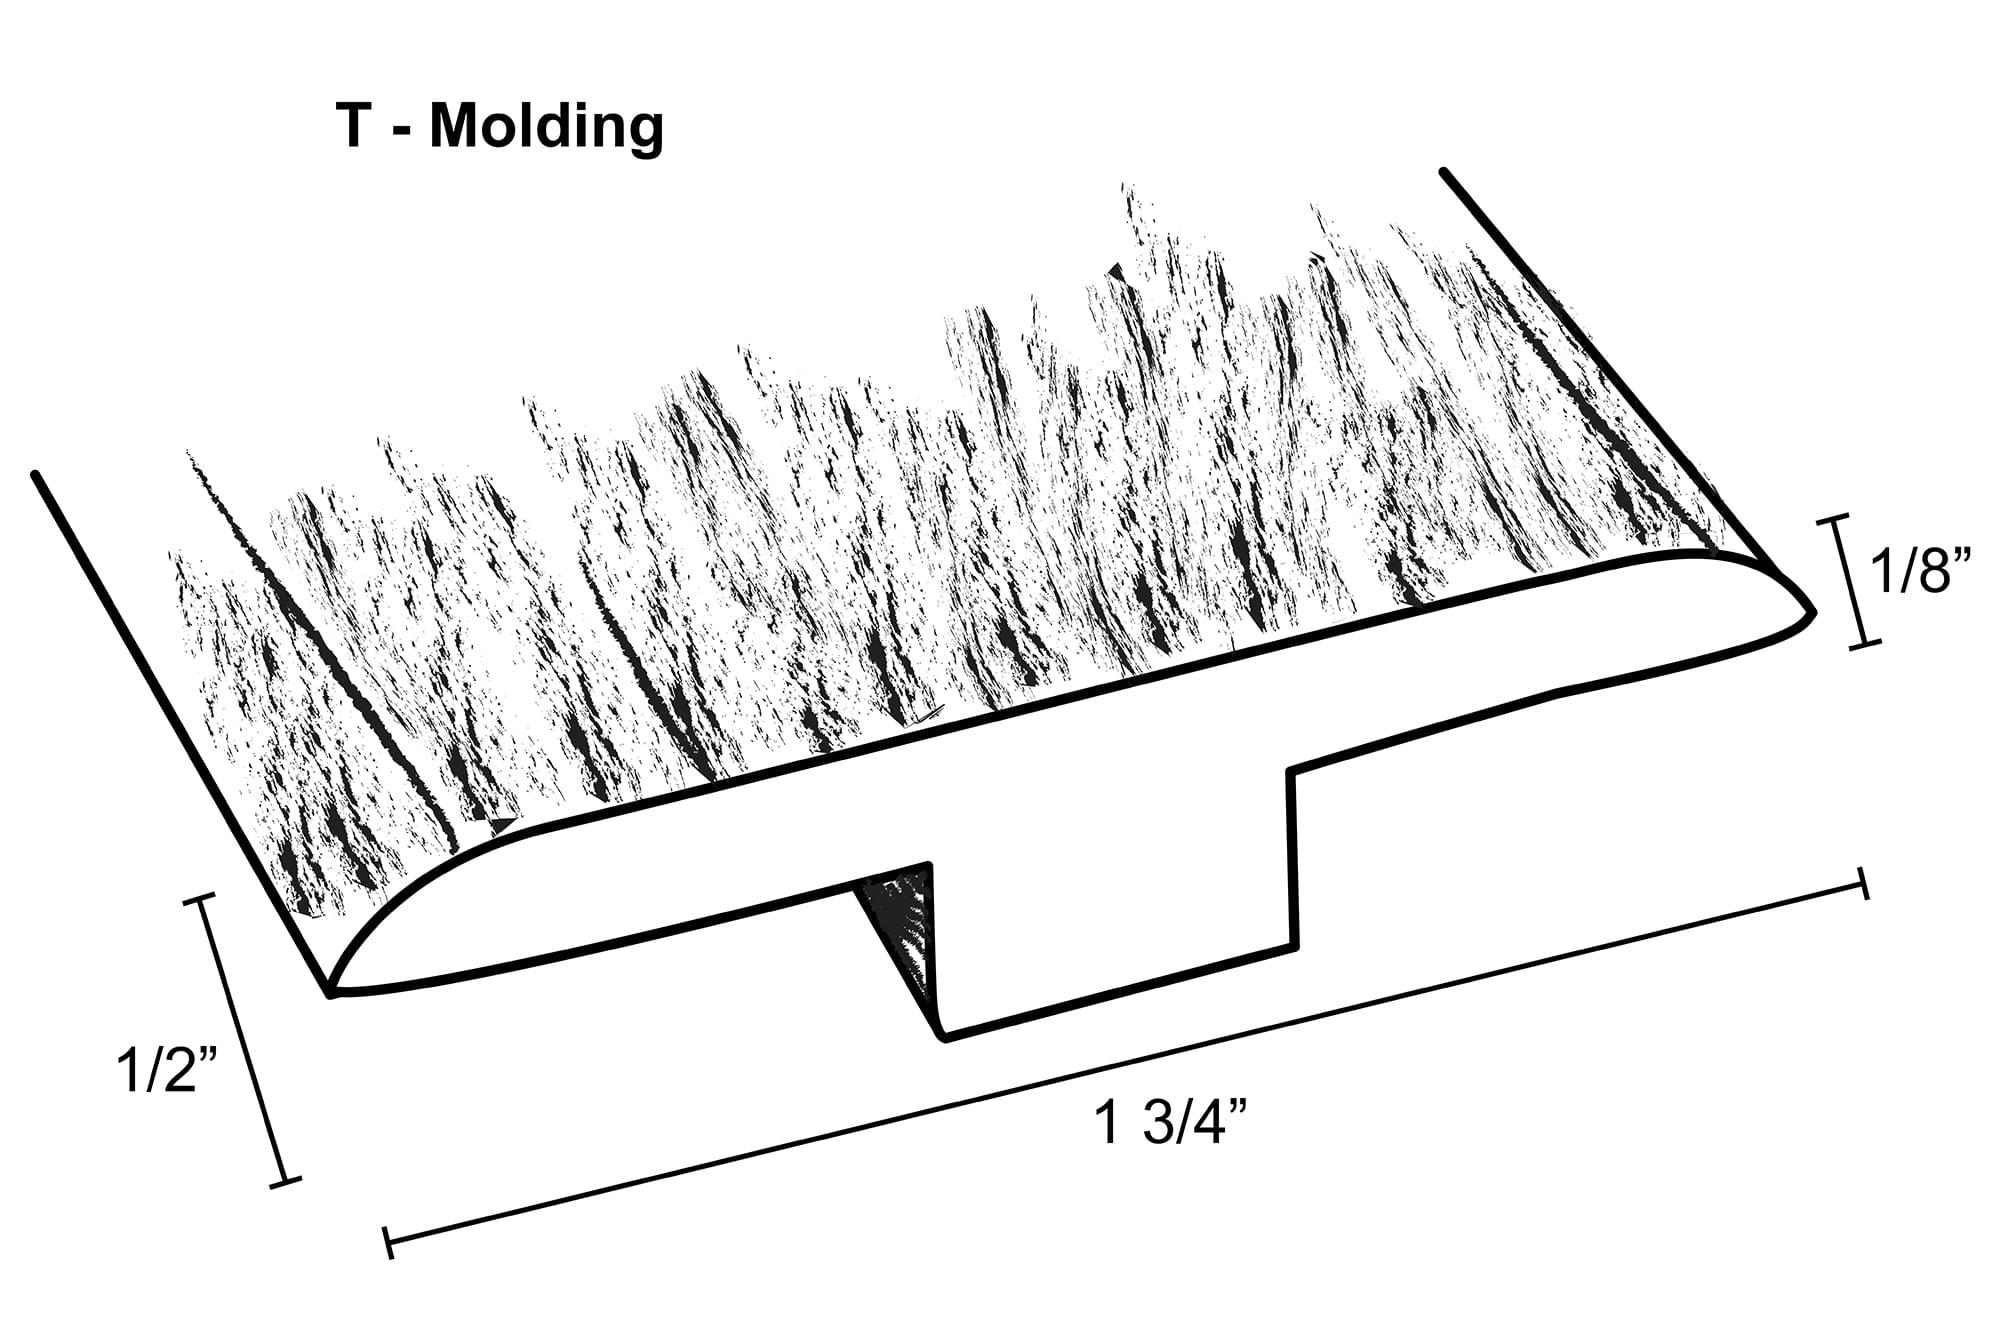 "Cog Railway Maple / T-Molding / 95-1/2""x 1-3/4""x 1/8"" Laminate Moldings - 12mm New England Collection - Cog Railway Maple 0"